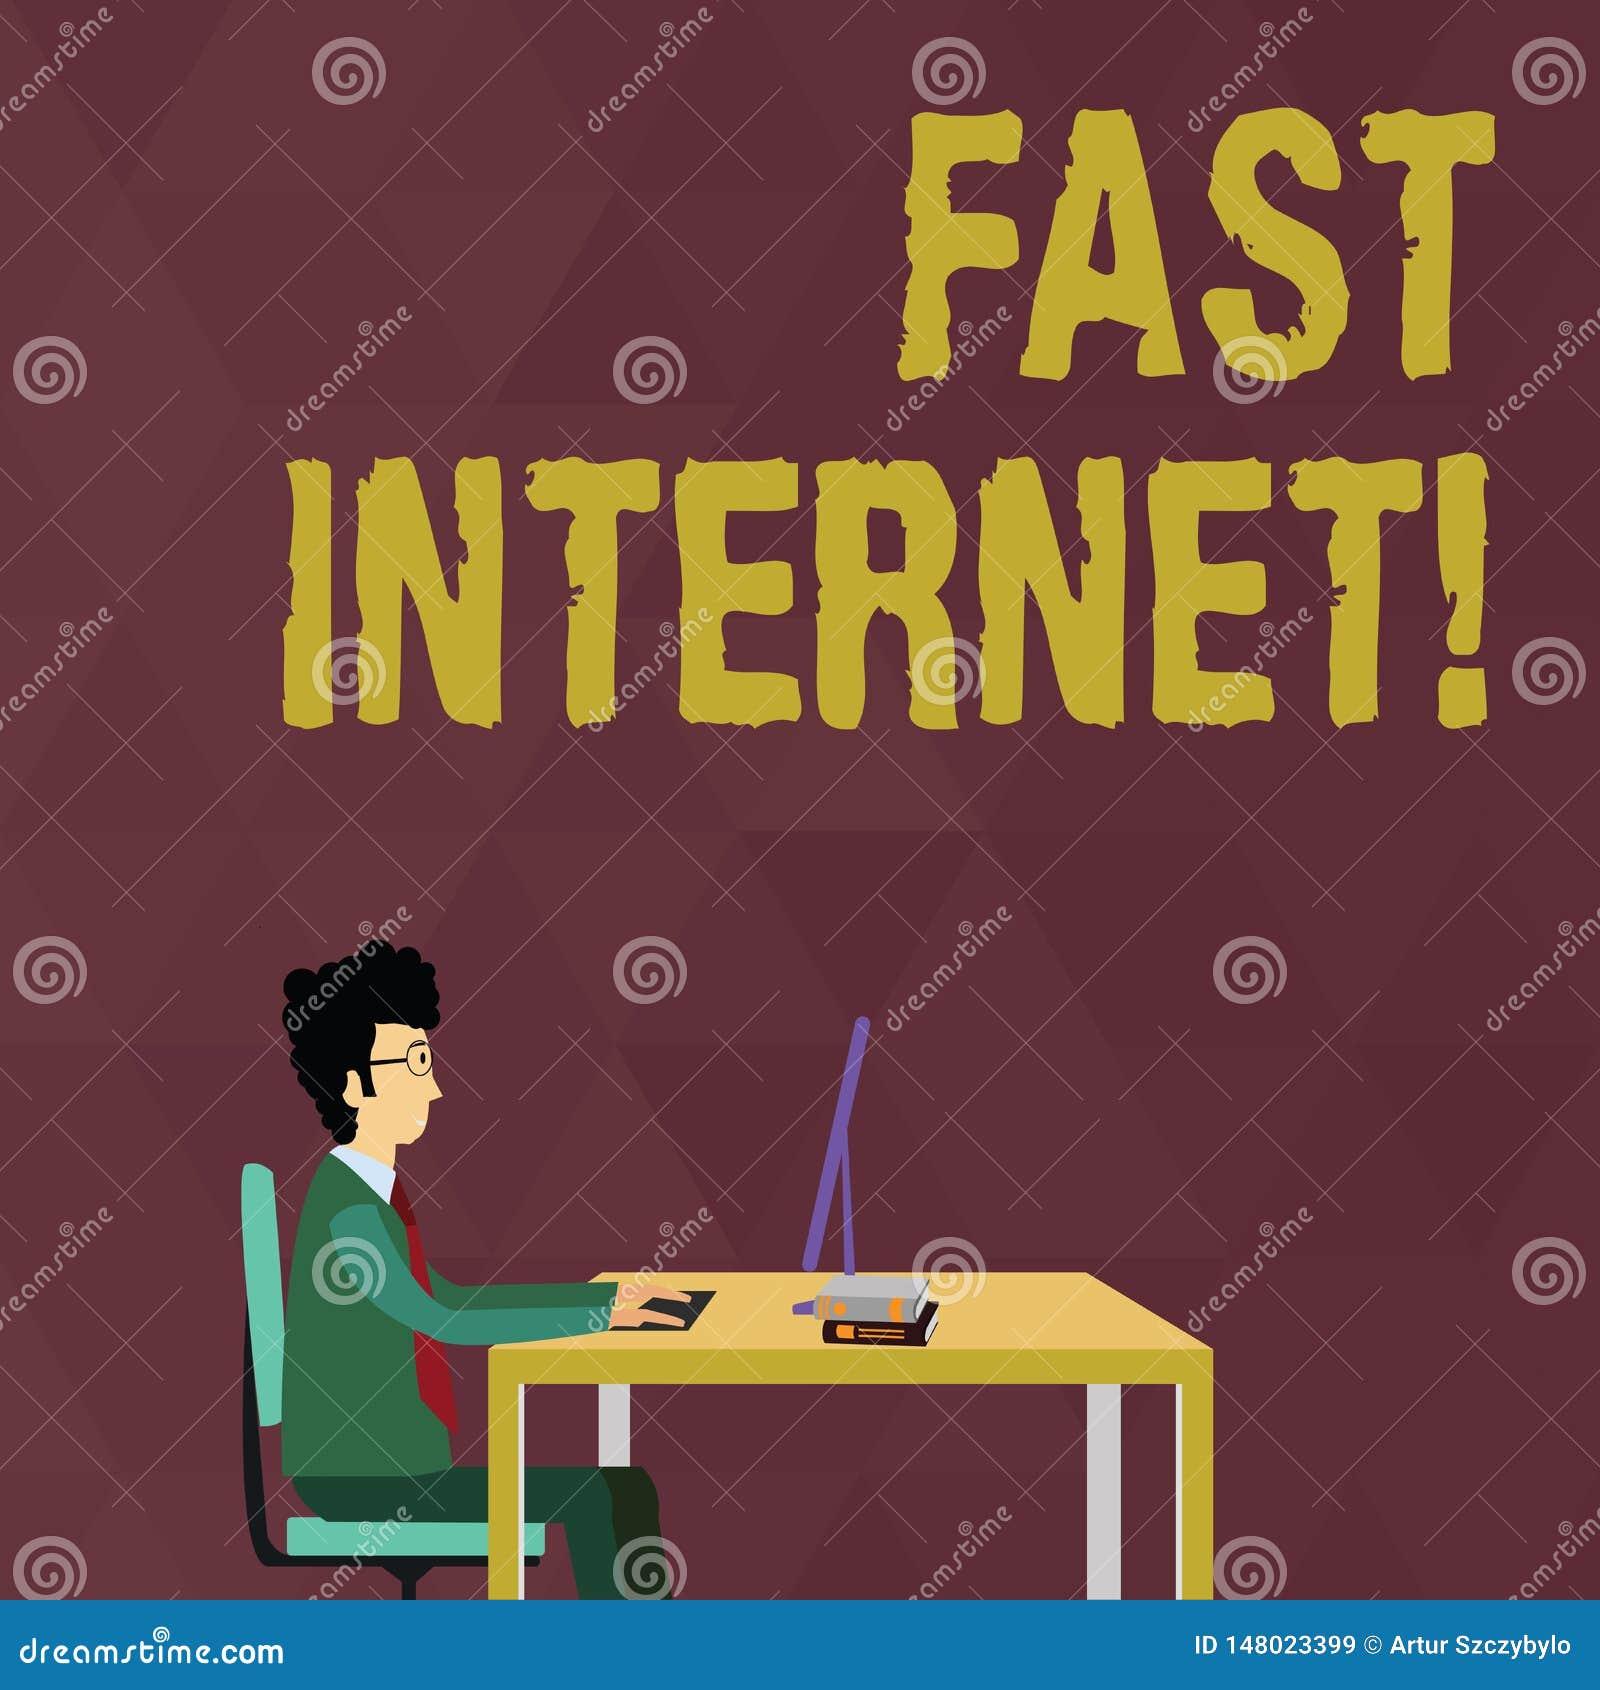 Essay about internet service